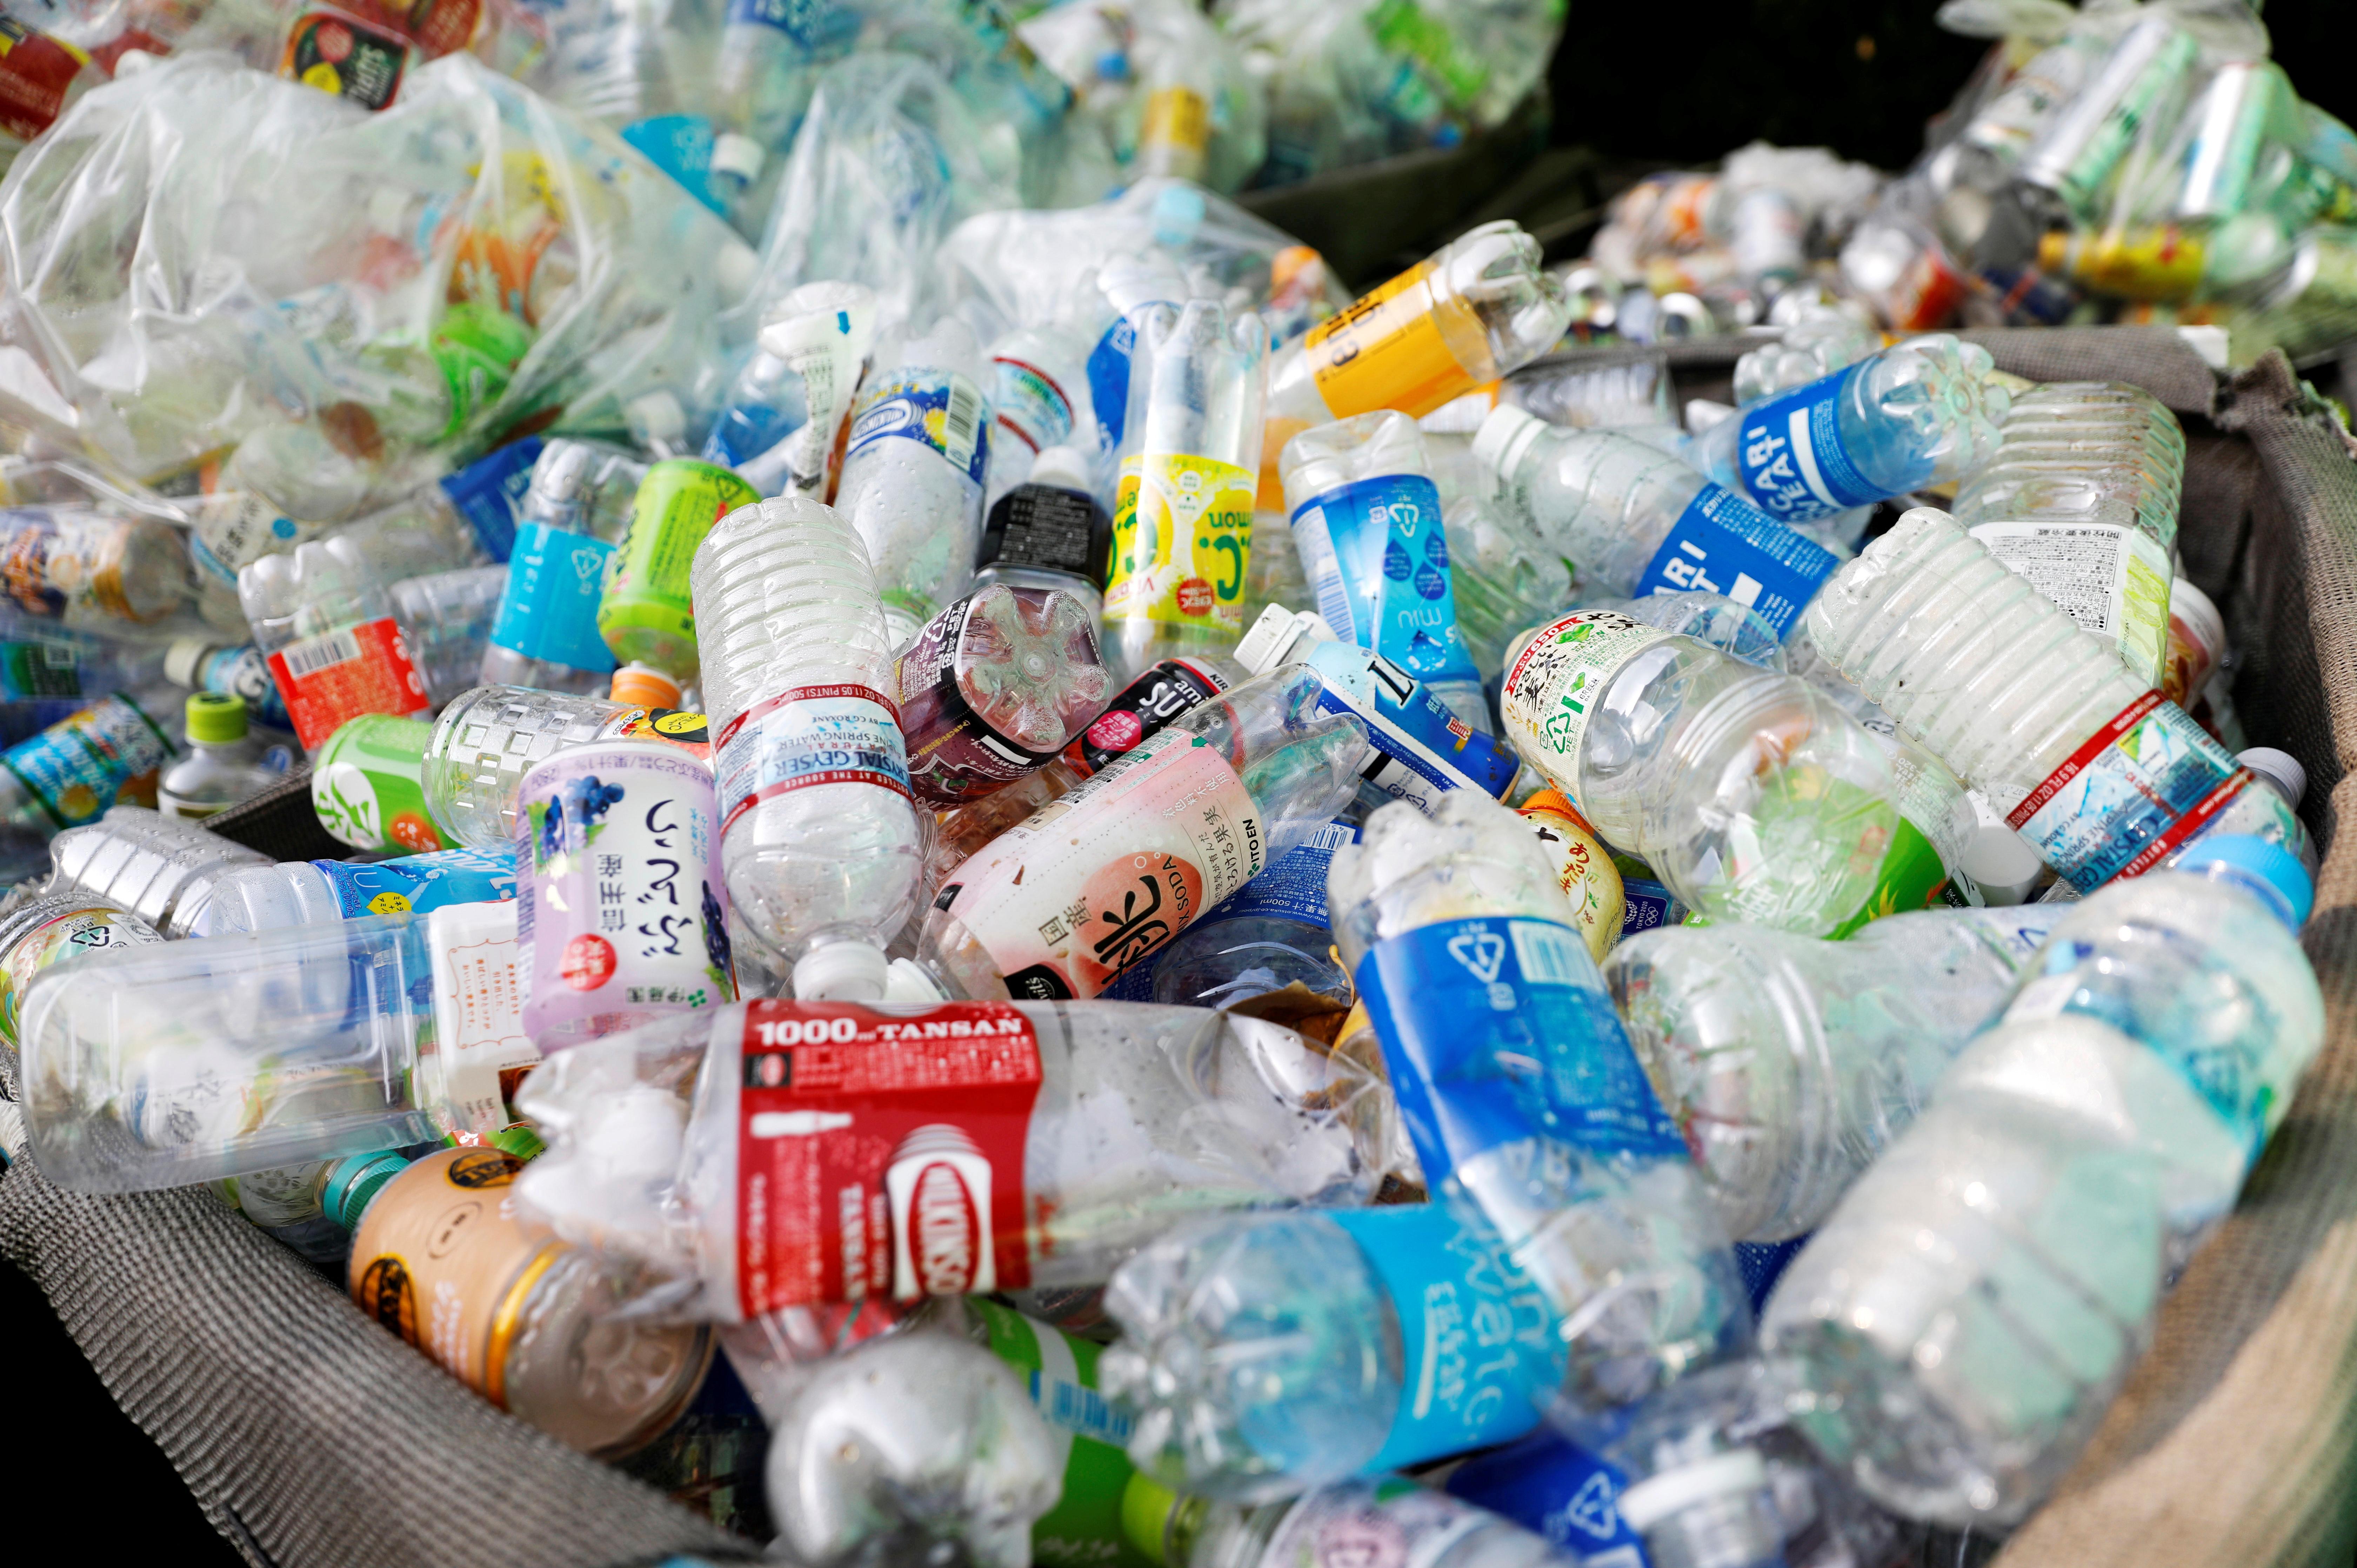 Big brands revisit the milkman model to cut plastic